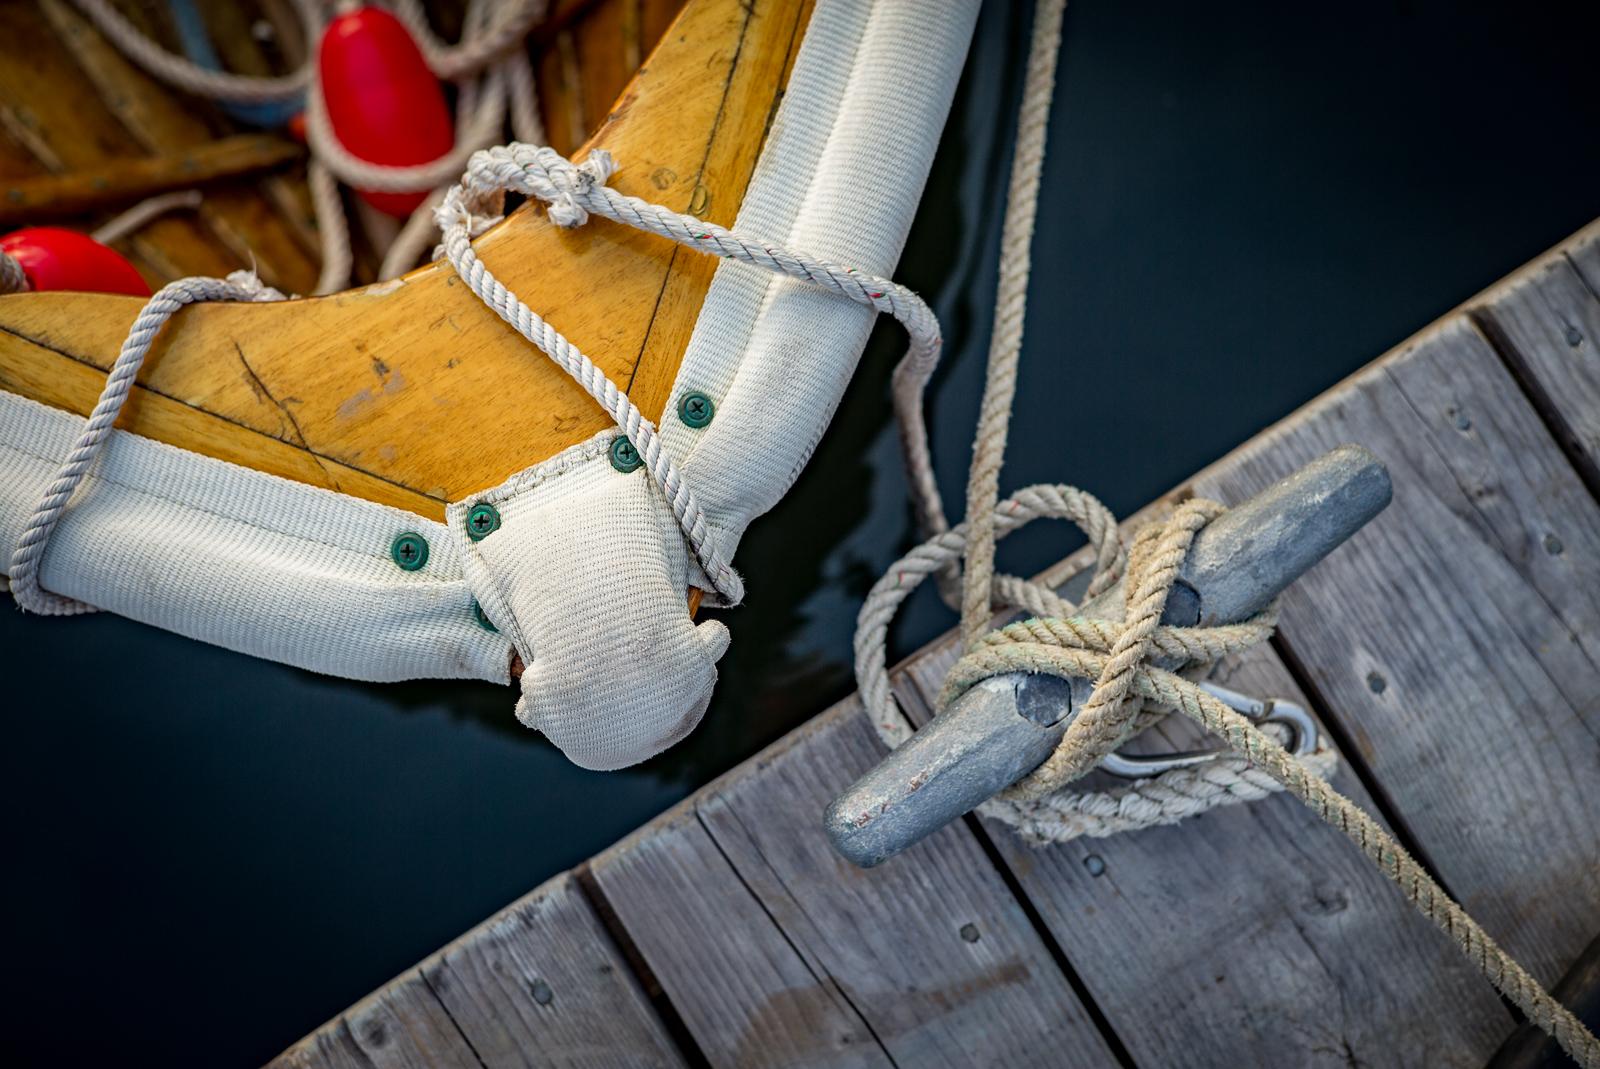 Maine, coast, harbor, rope, boat theme, bow, mid coast, New England